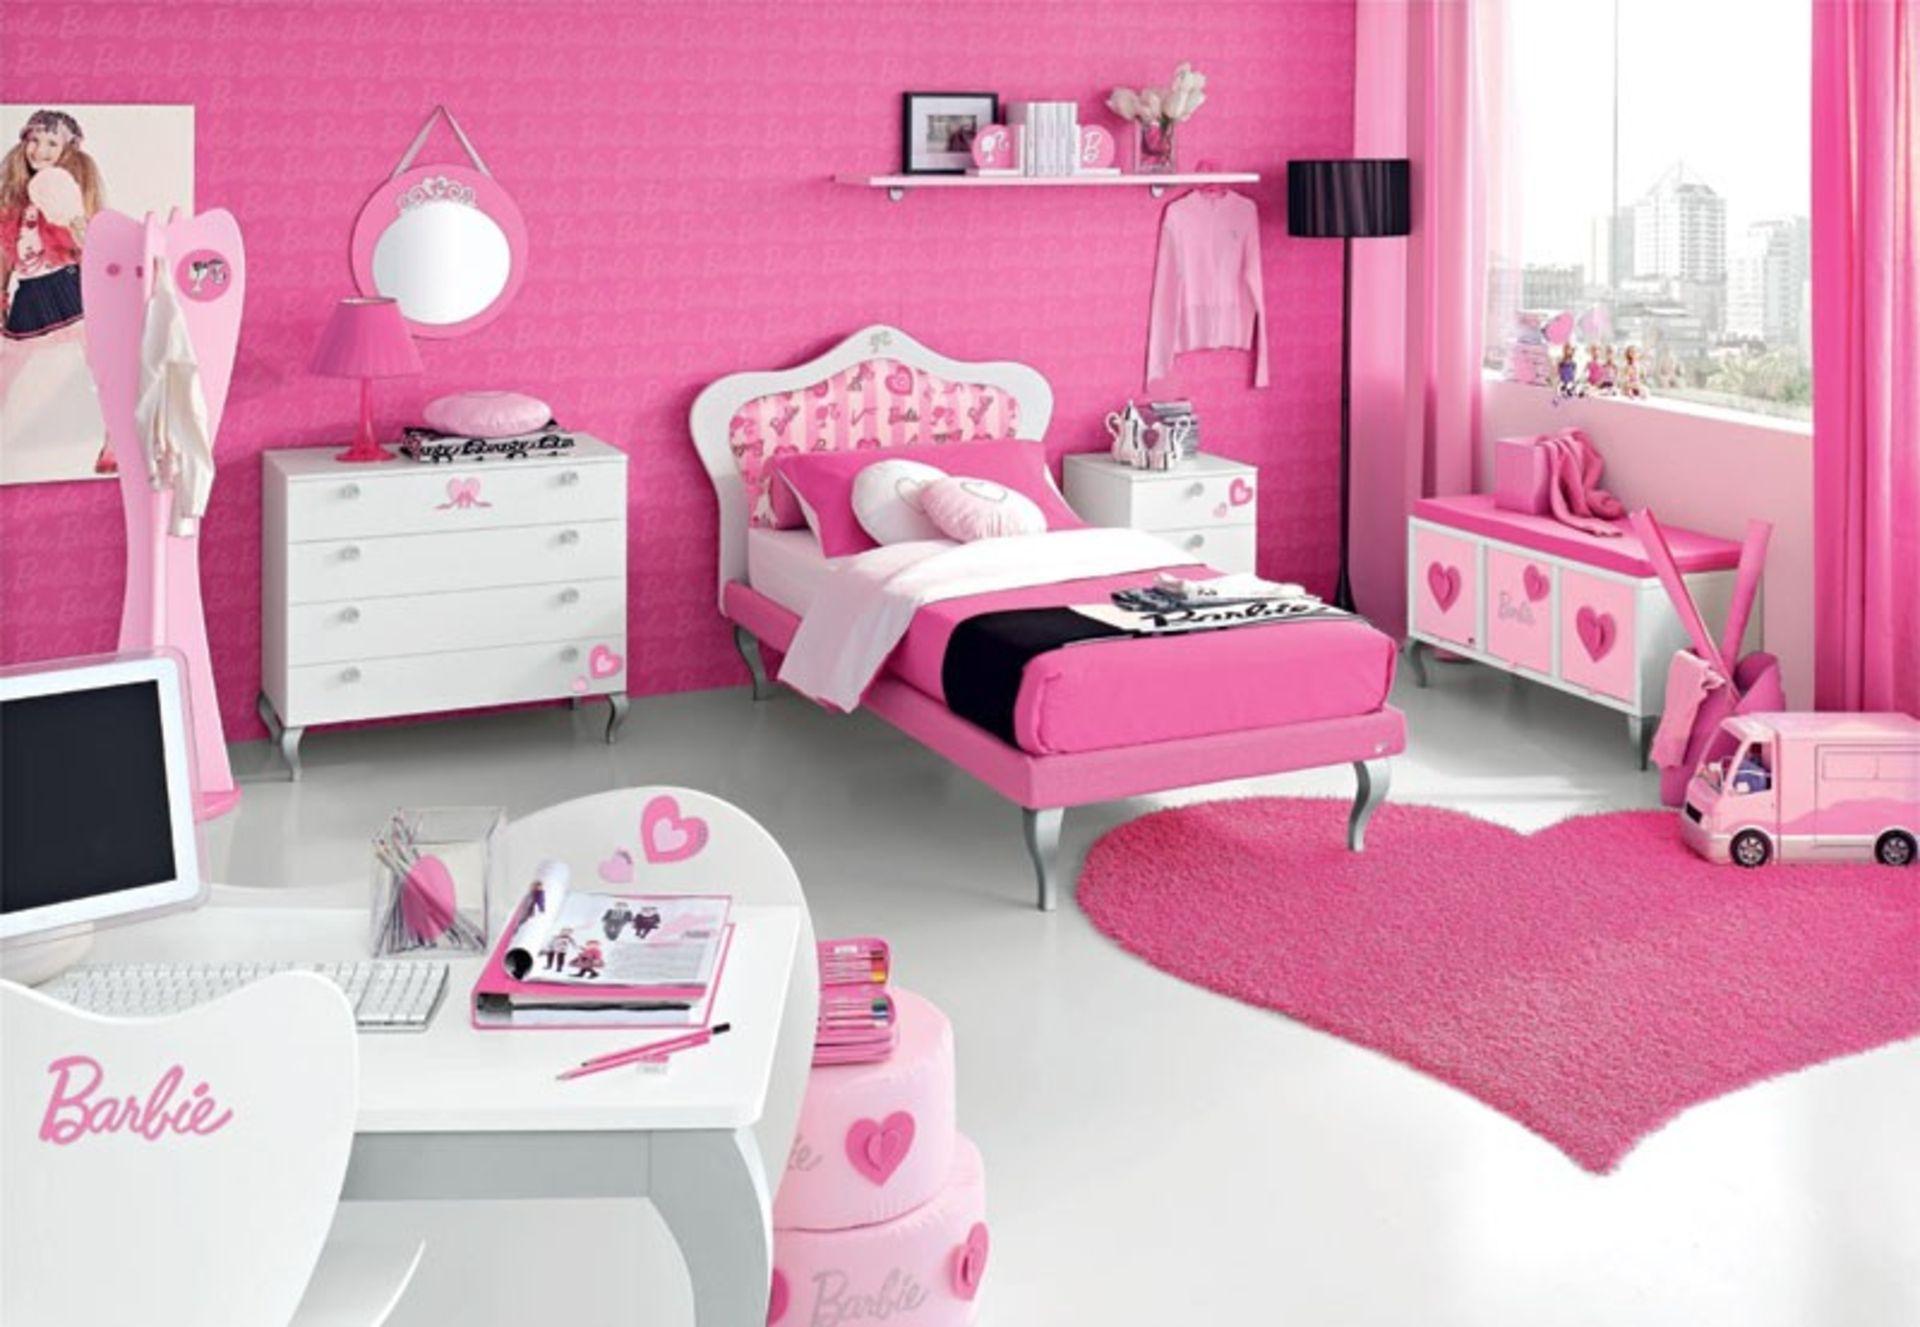 cute pink girl barbie themed bedroom design decorating ideasjpg 19201327 cute pink girl barbie themed bedroom design decorating ideasjpg